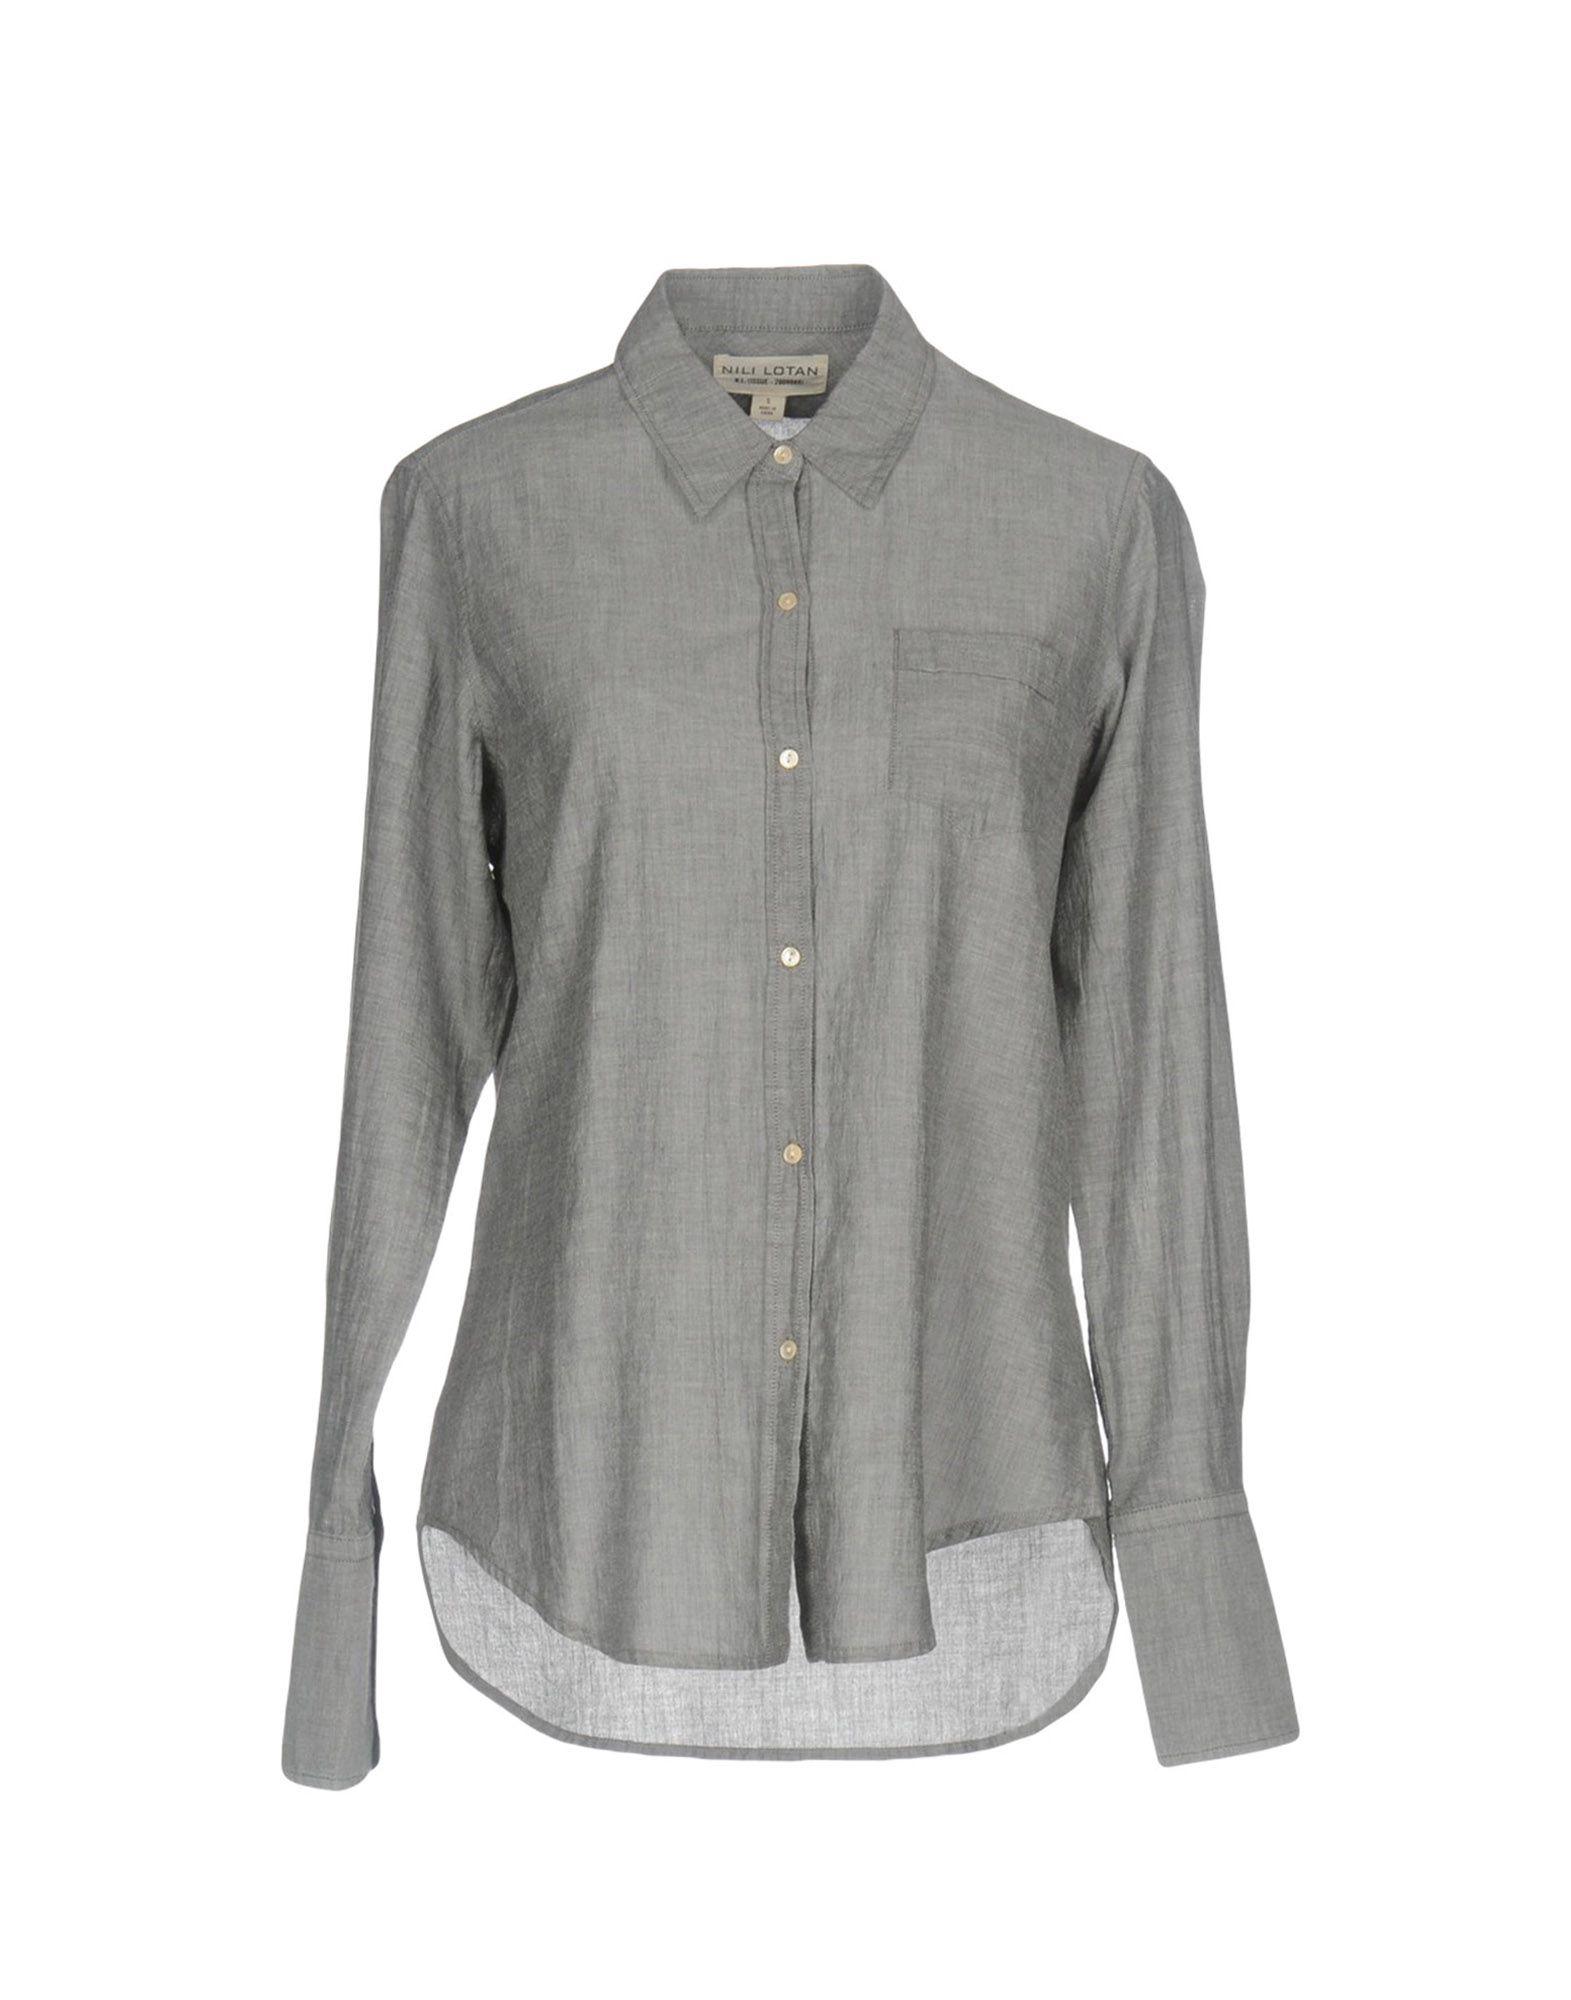 NILI LOTAN Pубашка цены онлайн